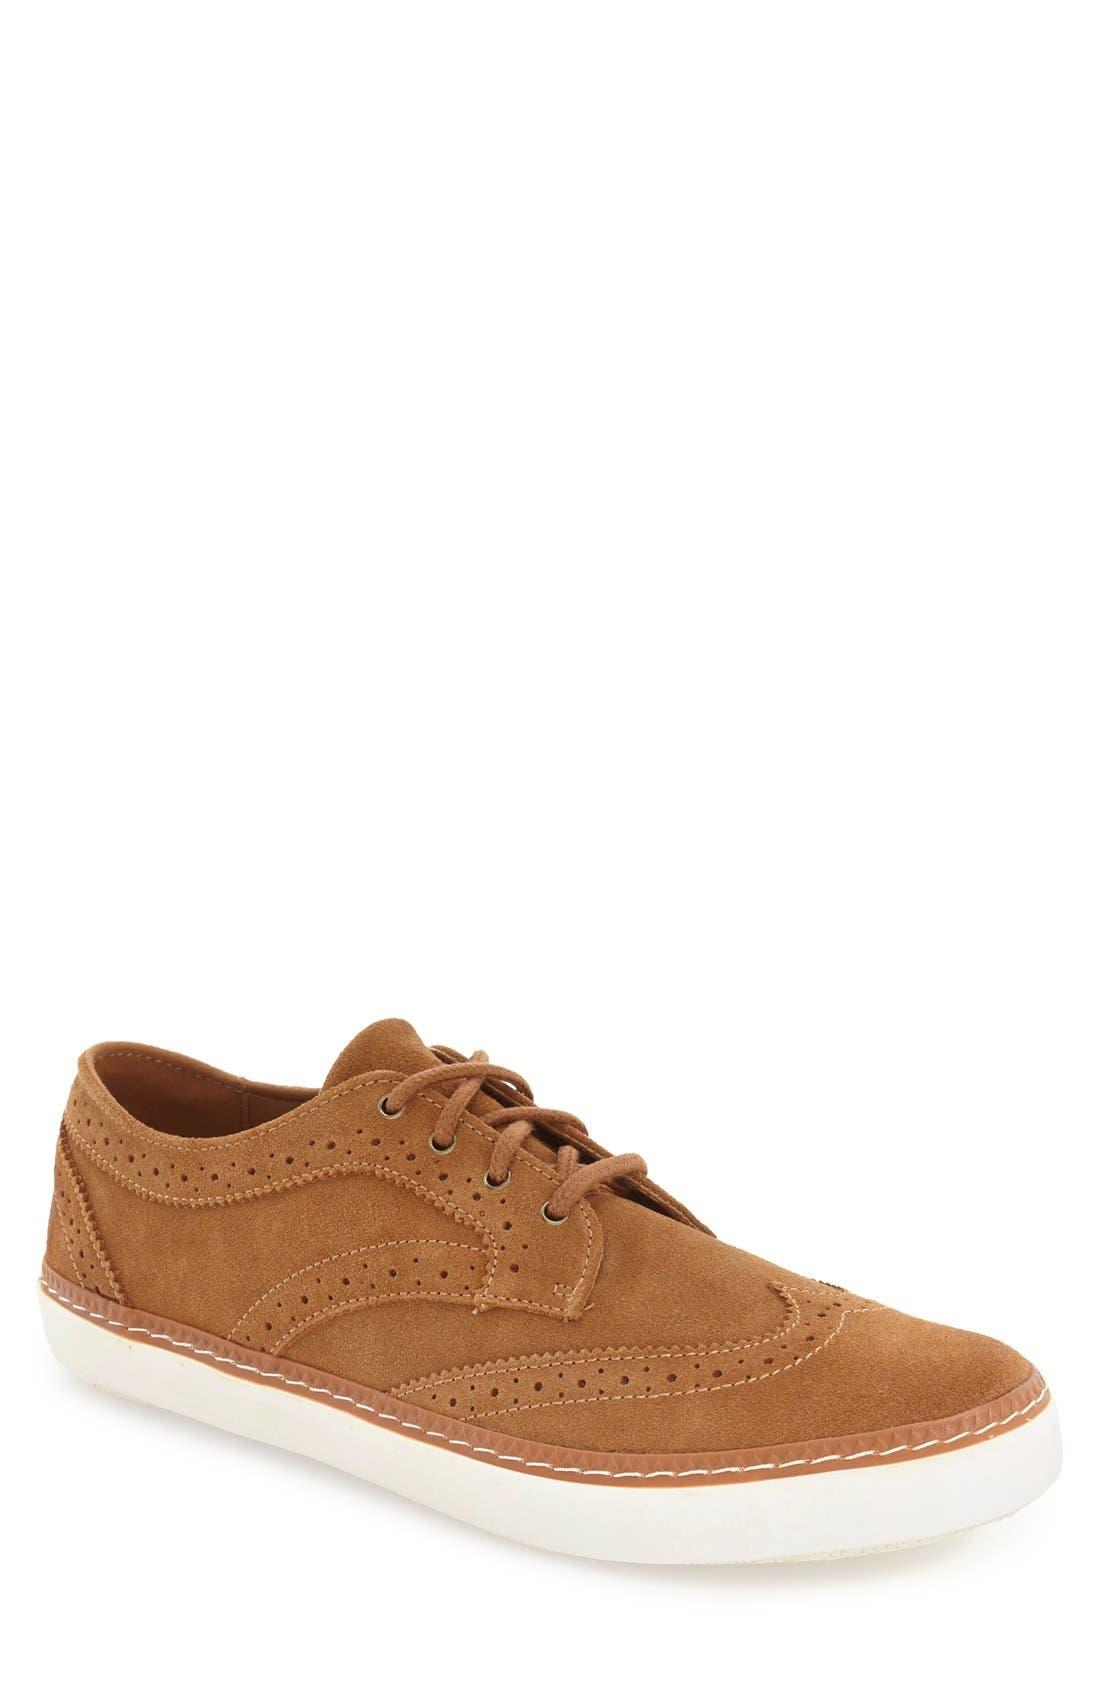 J SHOES 'Novello' Wingtip Sneaker (Men)